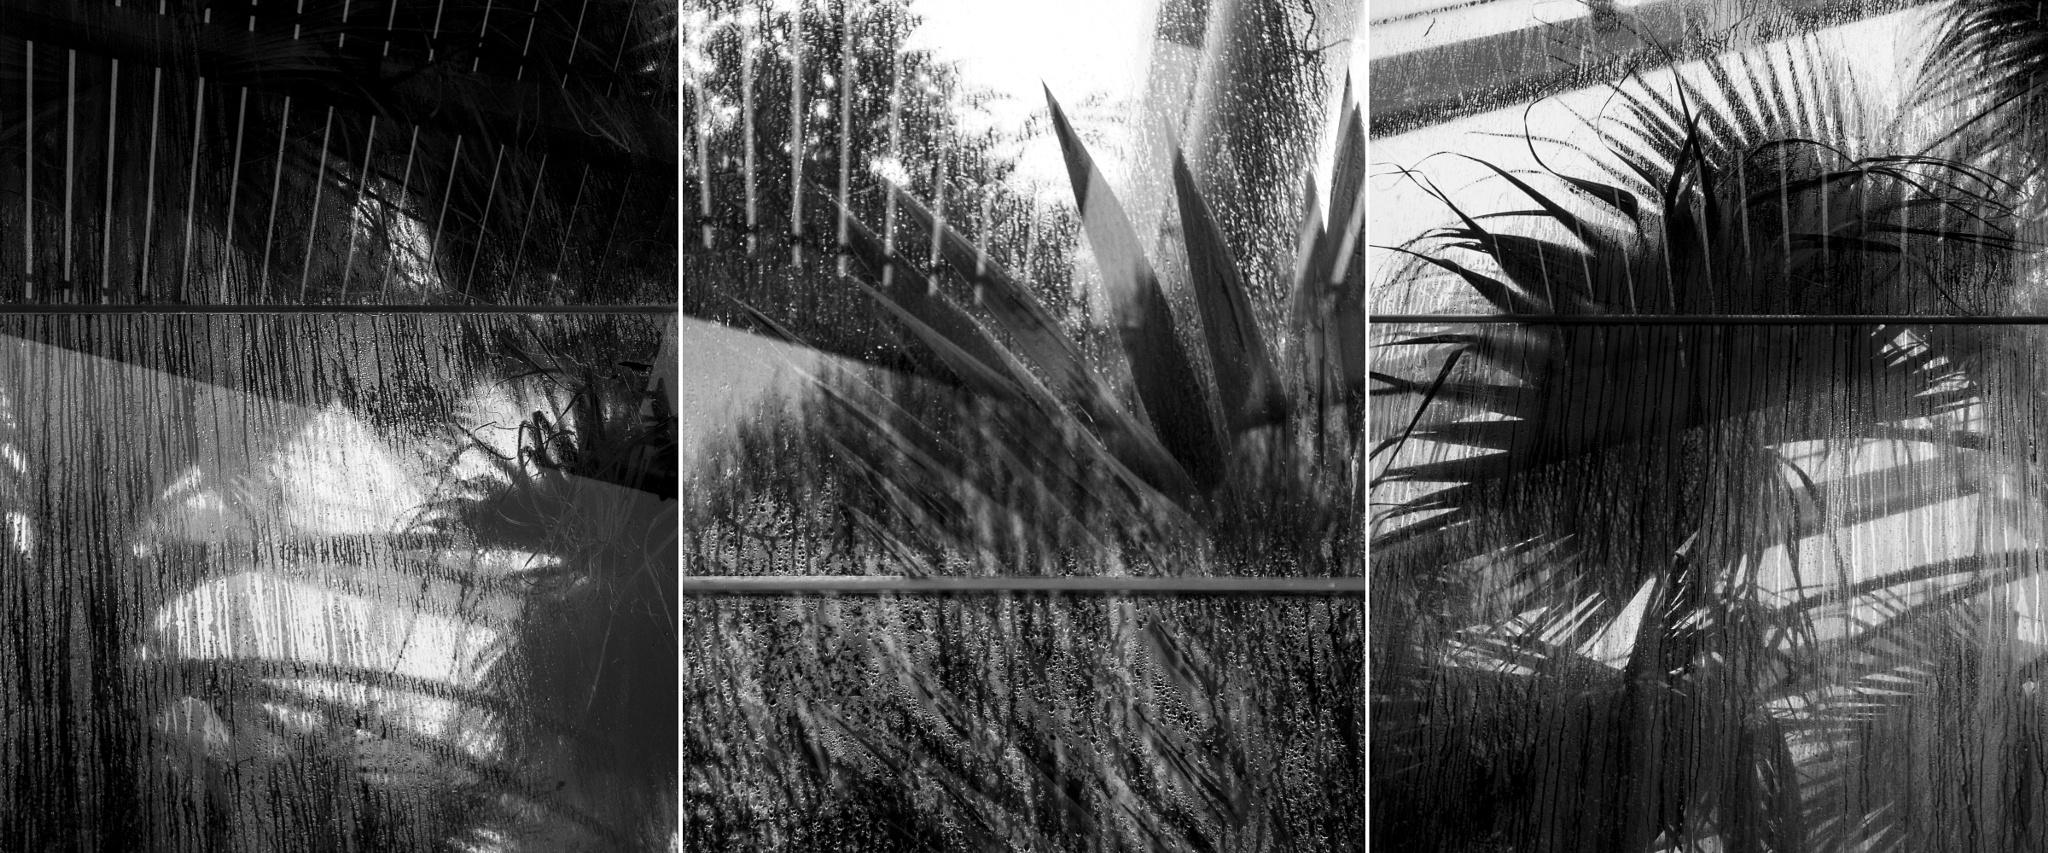 Triptych by SteveH